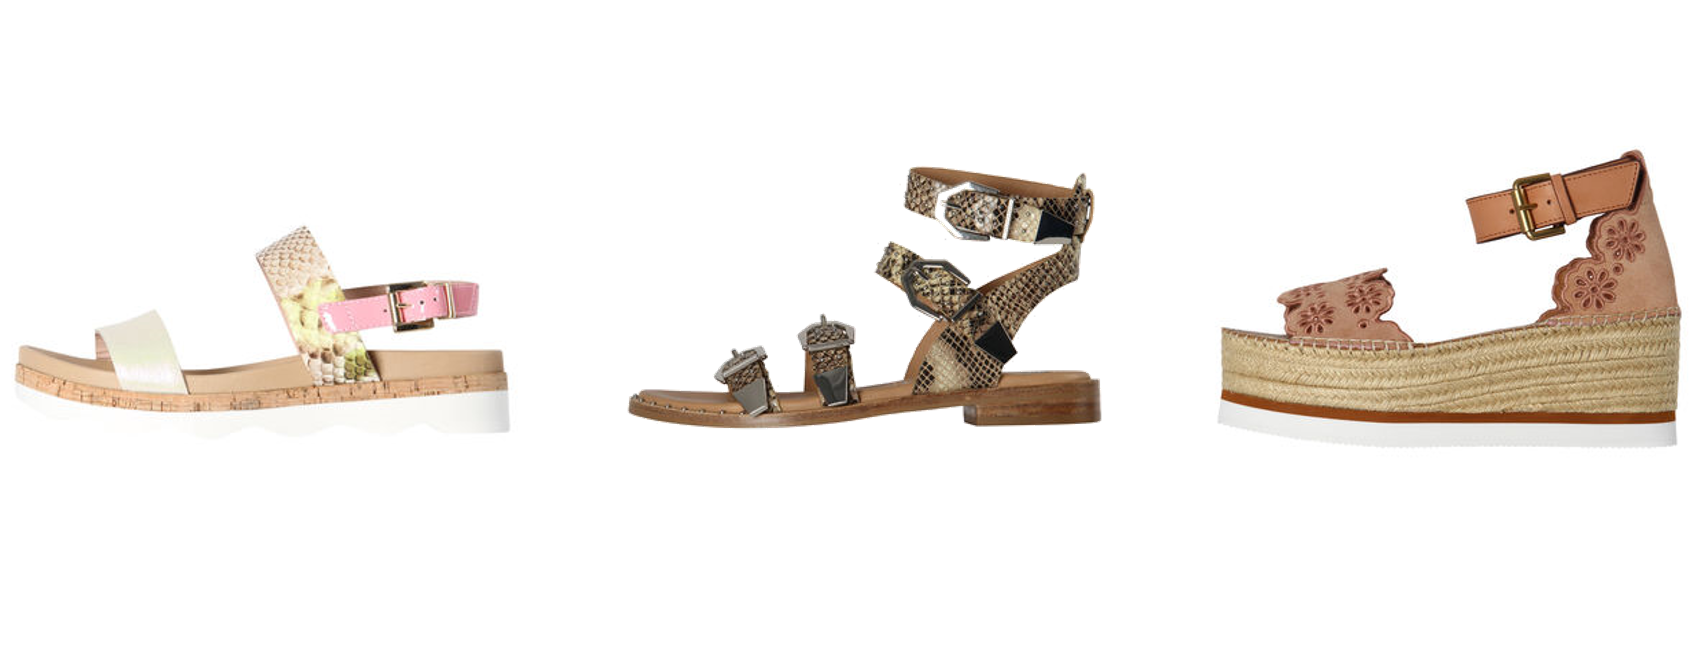 Flache Schuhe, Sandalen